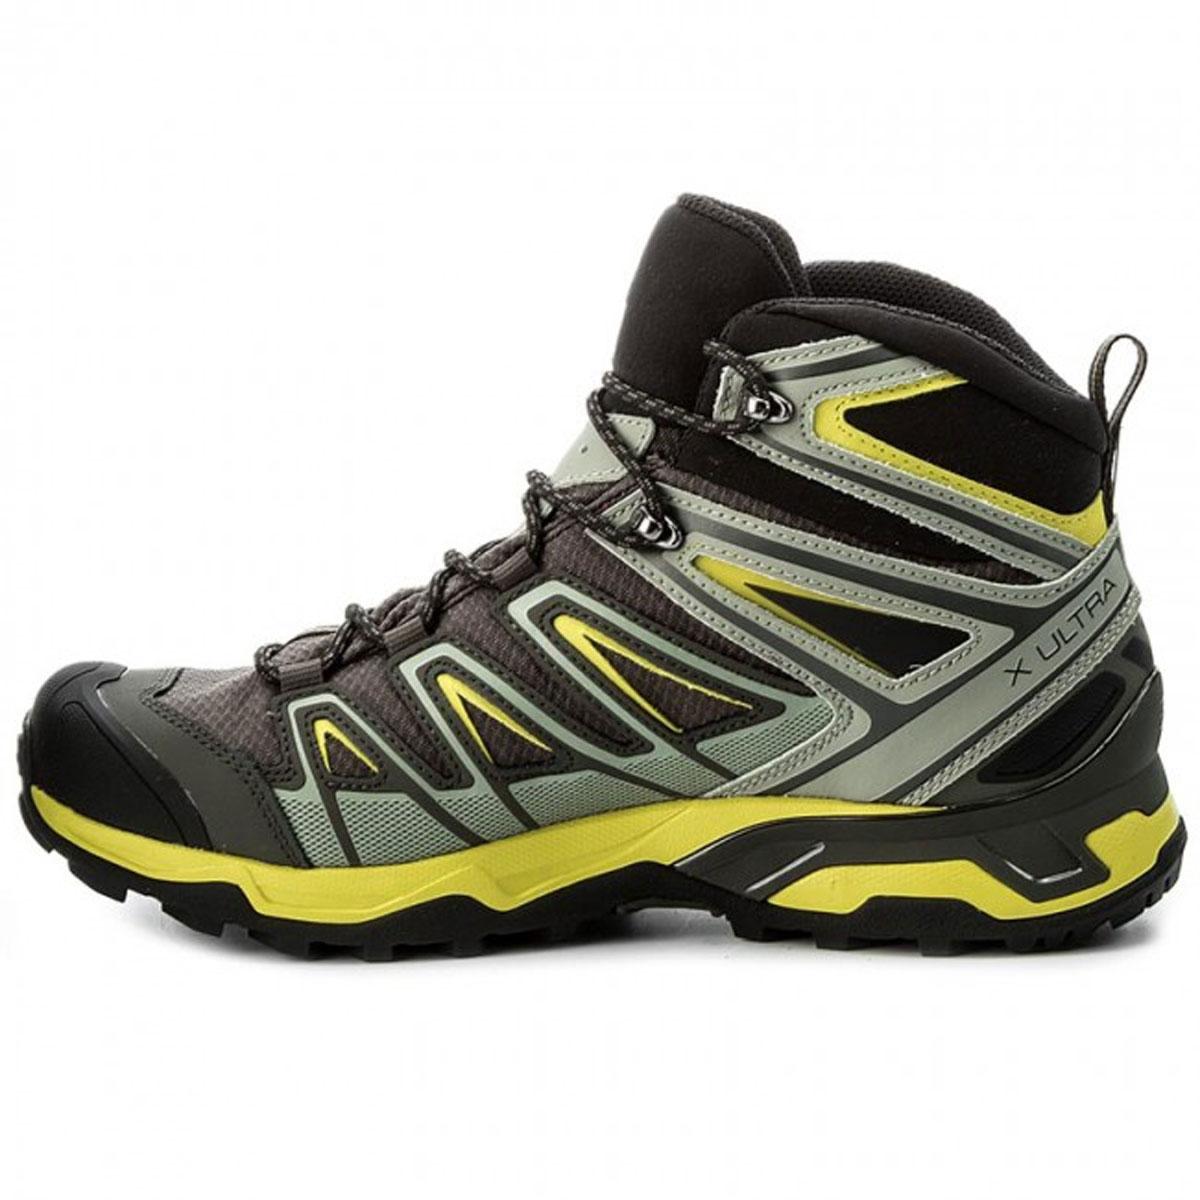 Salomon X Ultra 3 Mid GTX Gore Tex Men's Trekking Boots, BelugaShadowSulphur Spring Bike Sport Adventure